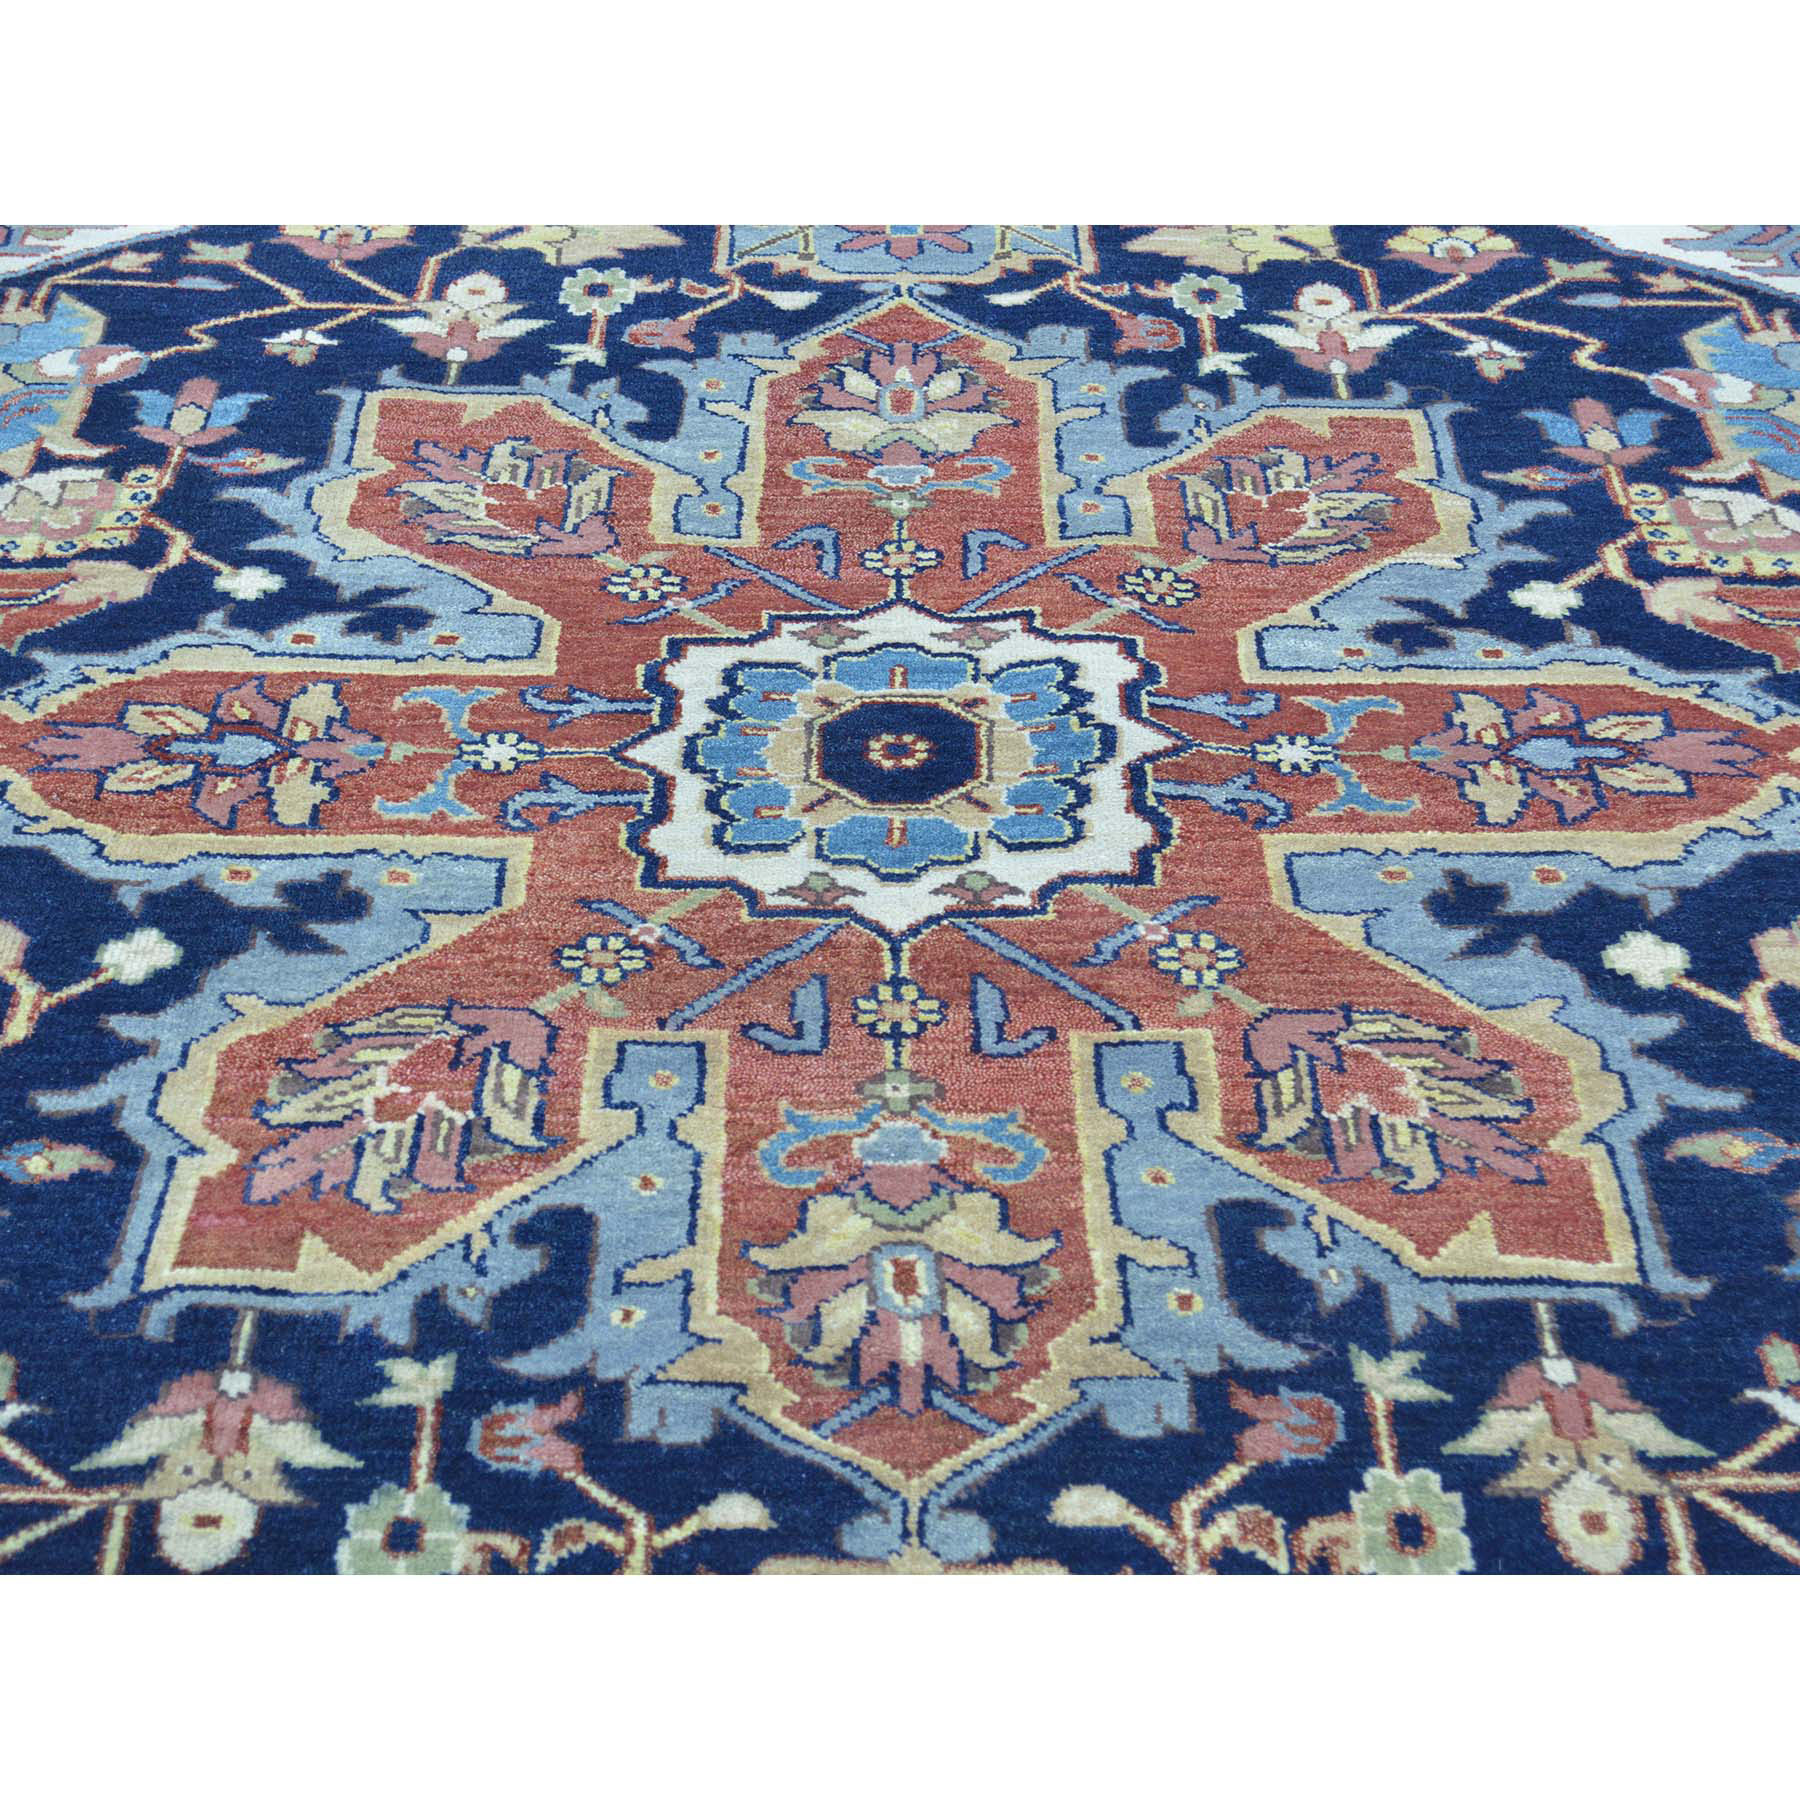 8-6 x11-10  Pure Wool Hand Knotted Navy Blue Serapi Heriz Oriental Rug